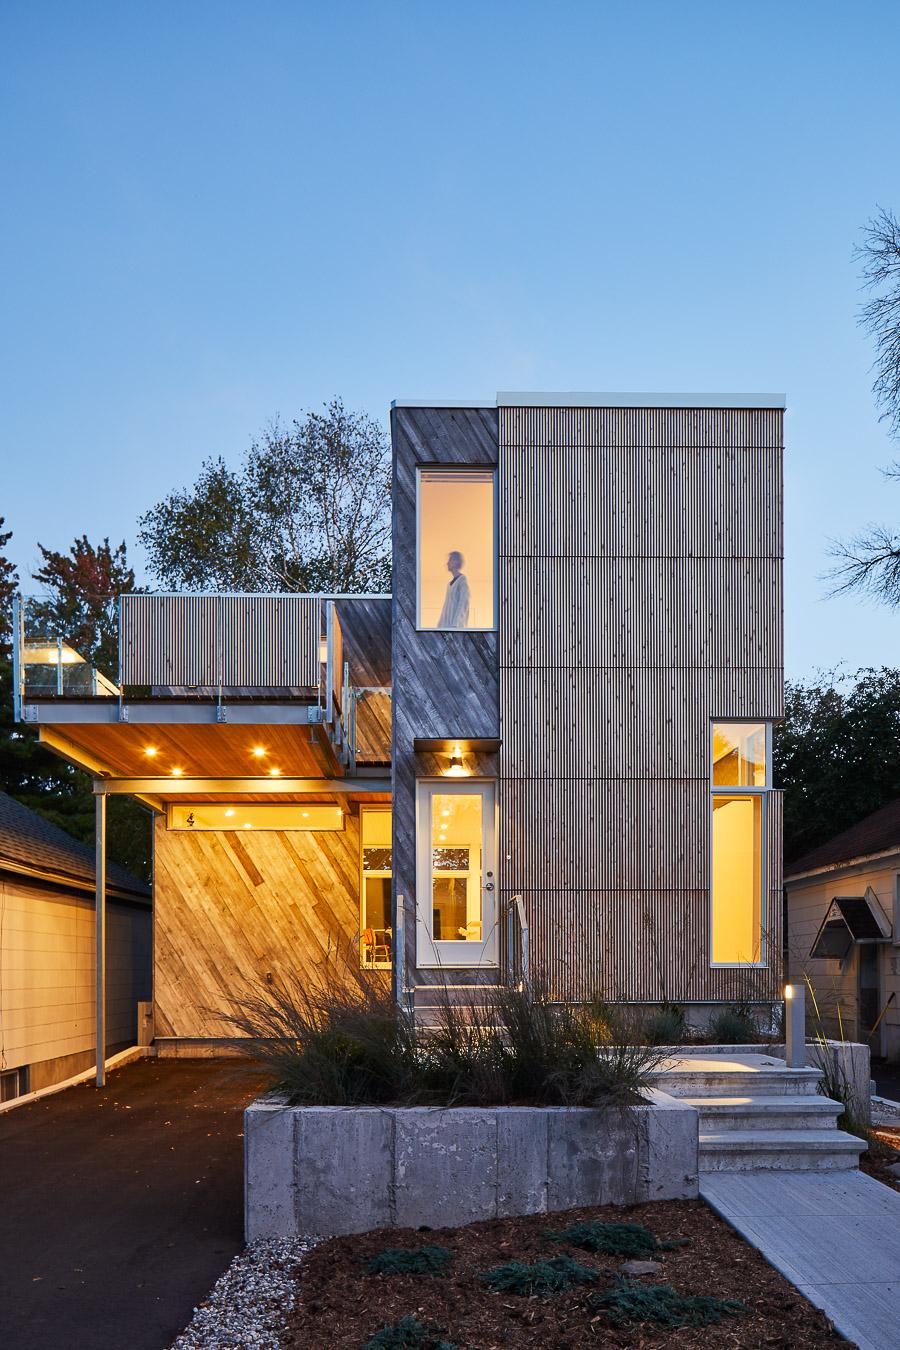 050-Shean Architects Fentiman.jpg